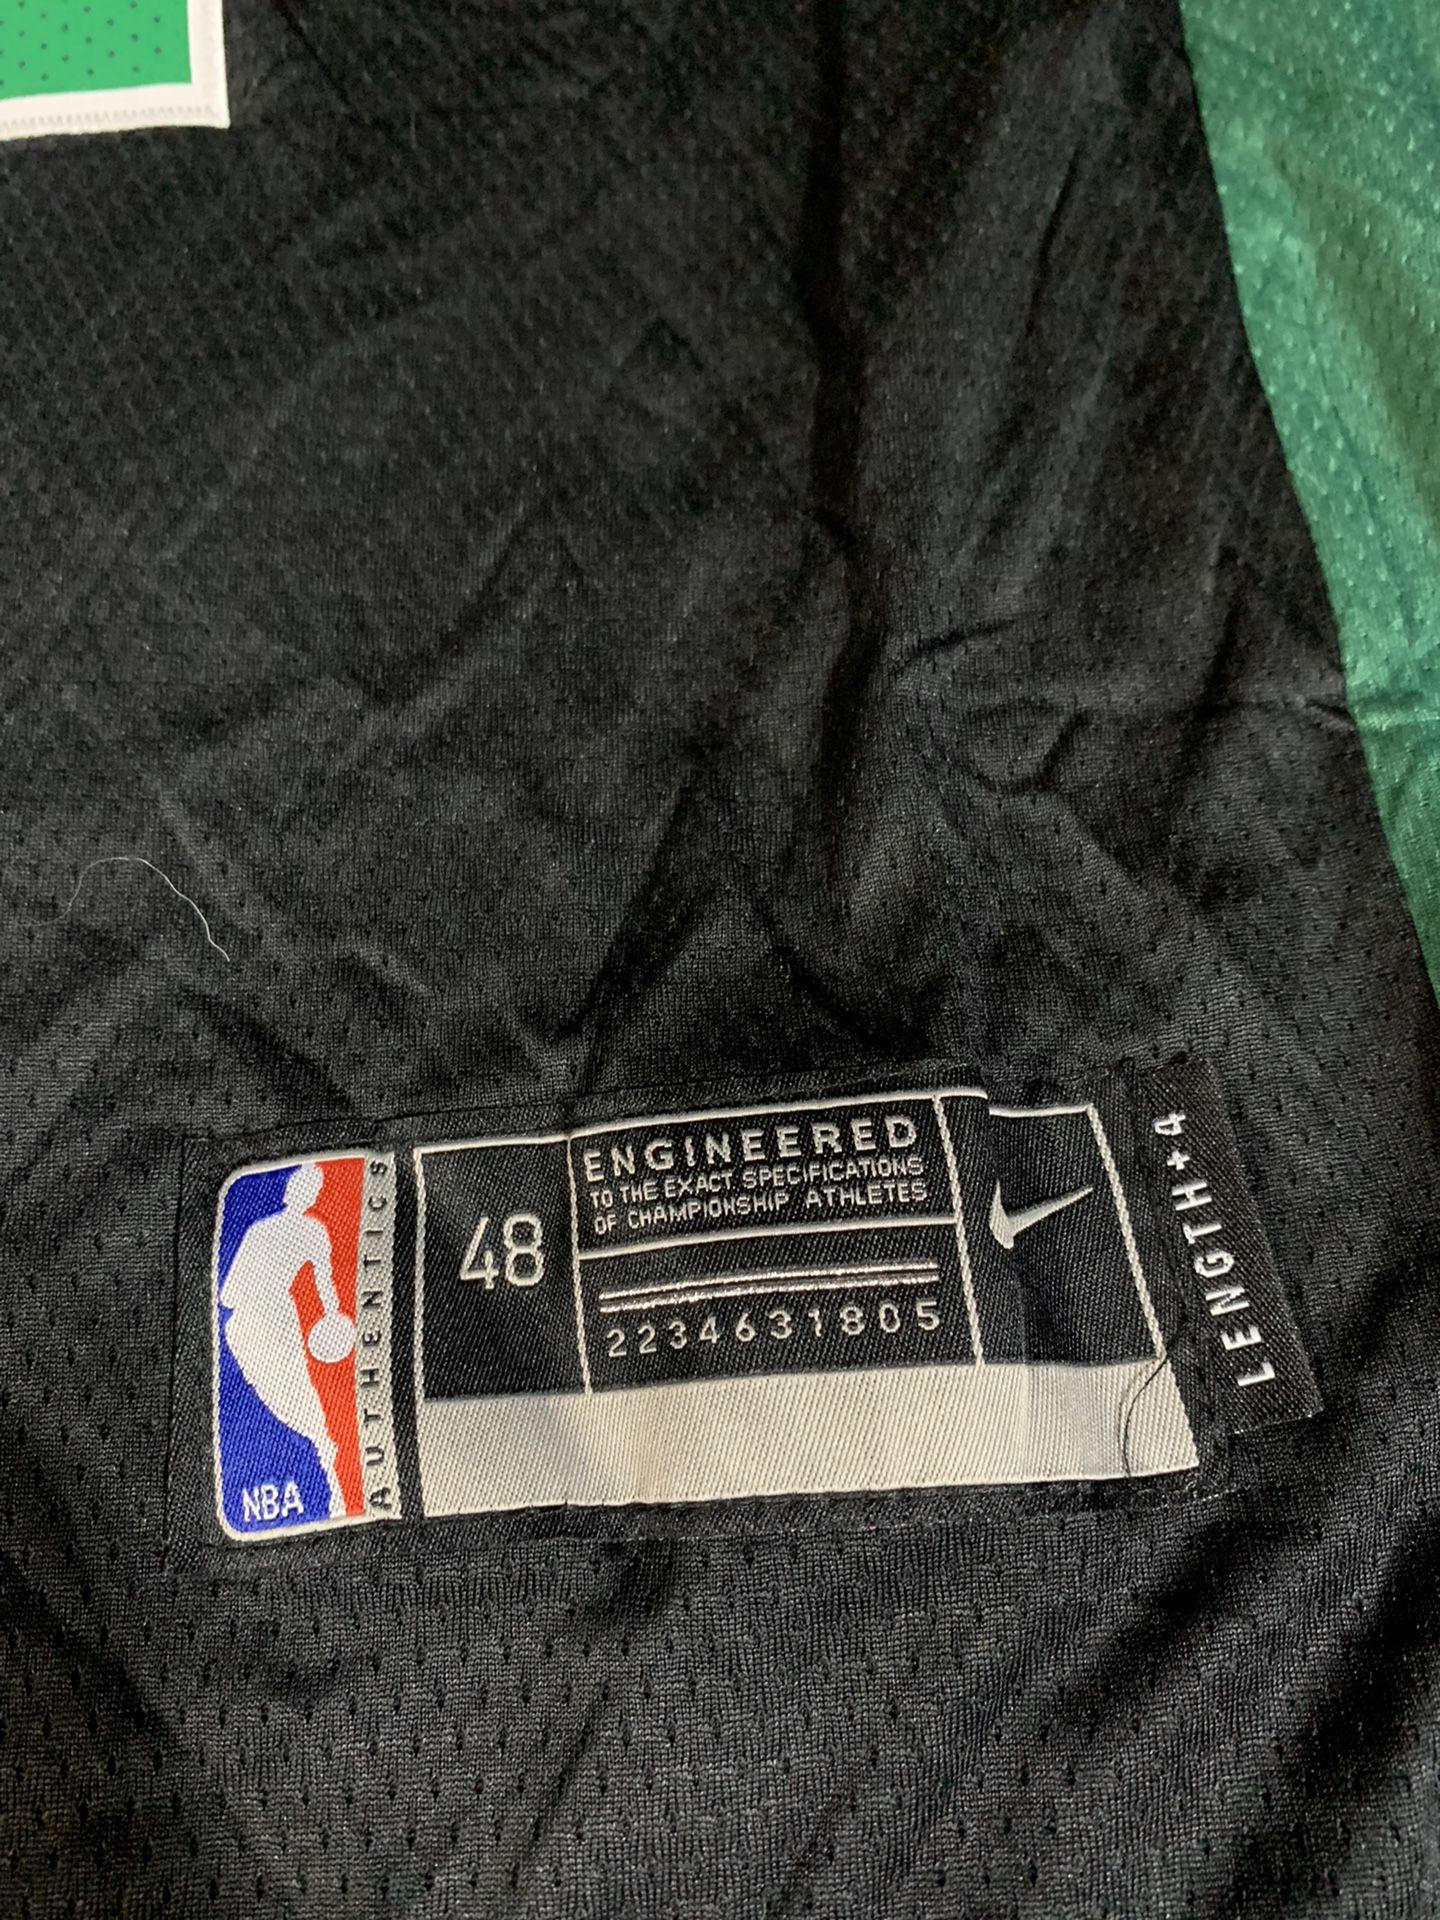 Mens Nike Kyrie Irving Boston Celtics NBA Basketball Jersey Size Large New